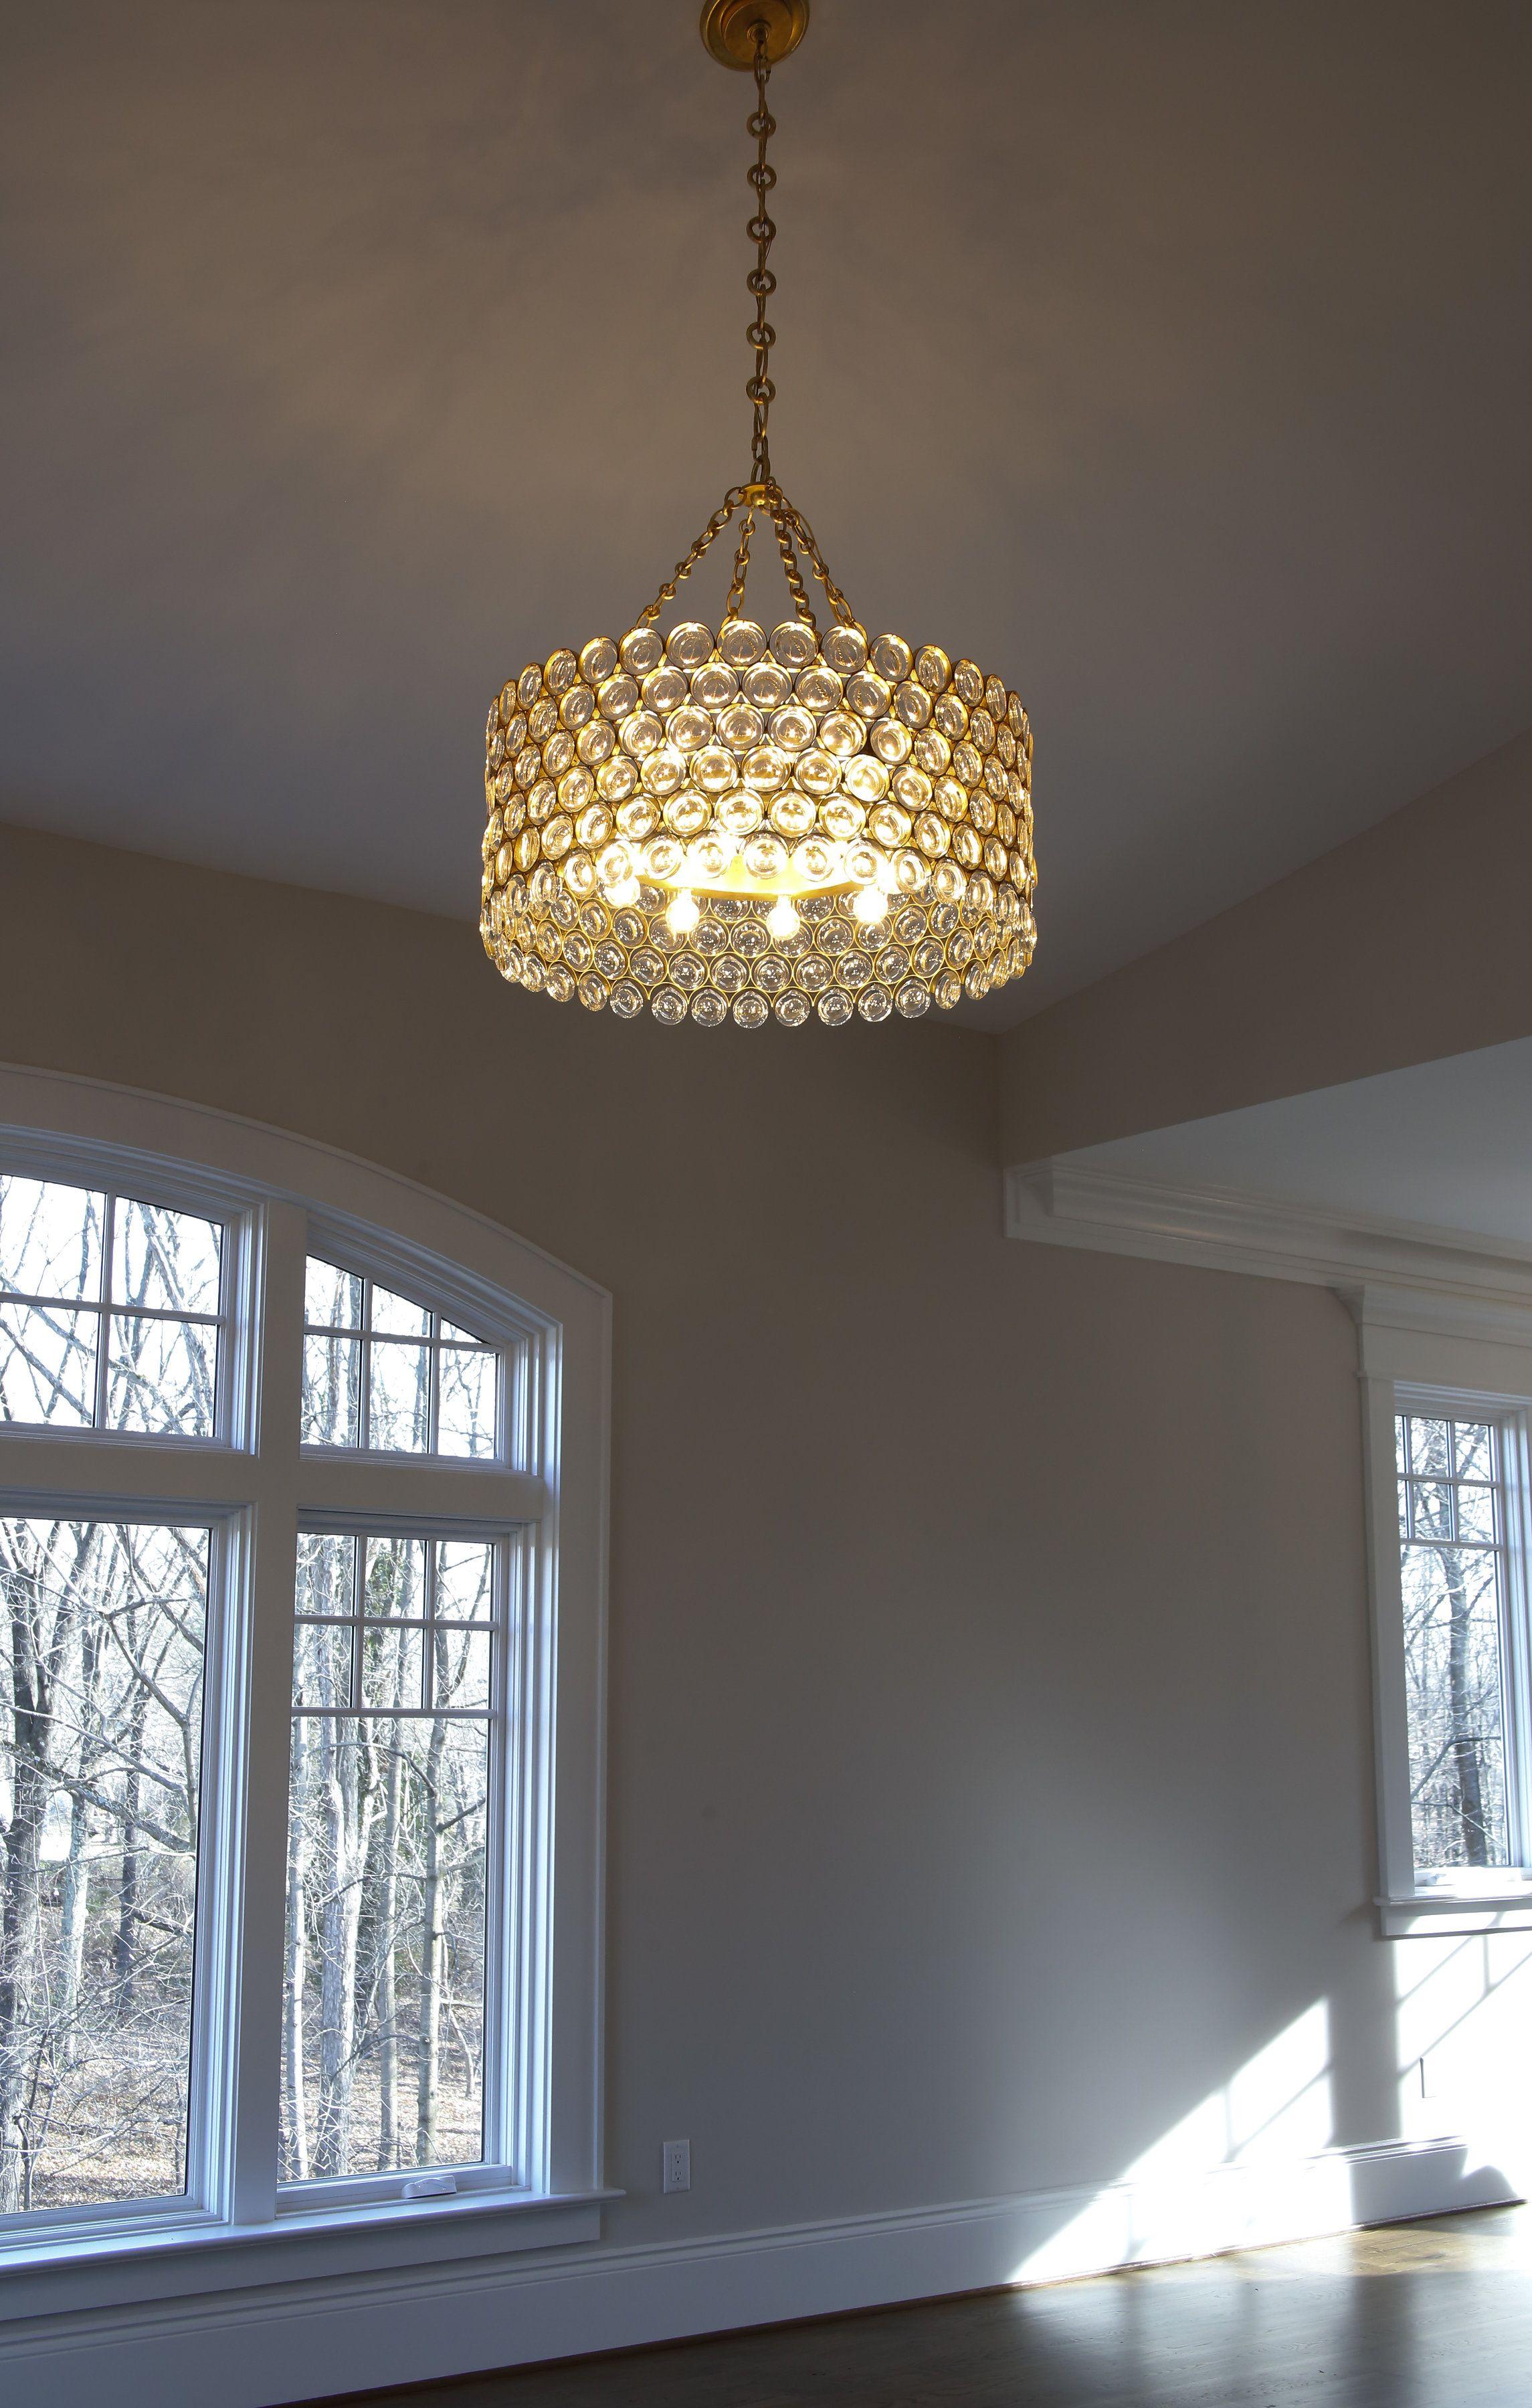 Lighting Design By Erin Schwartz Private Home In Clifton Virginia Still Under Con Contemporary Ceiling Light Hanging Bedroom Lights Natural Bathroom Interior